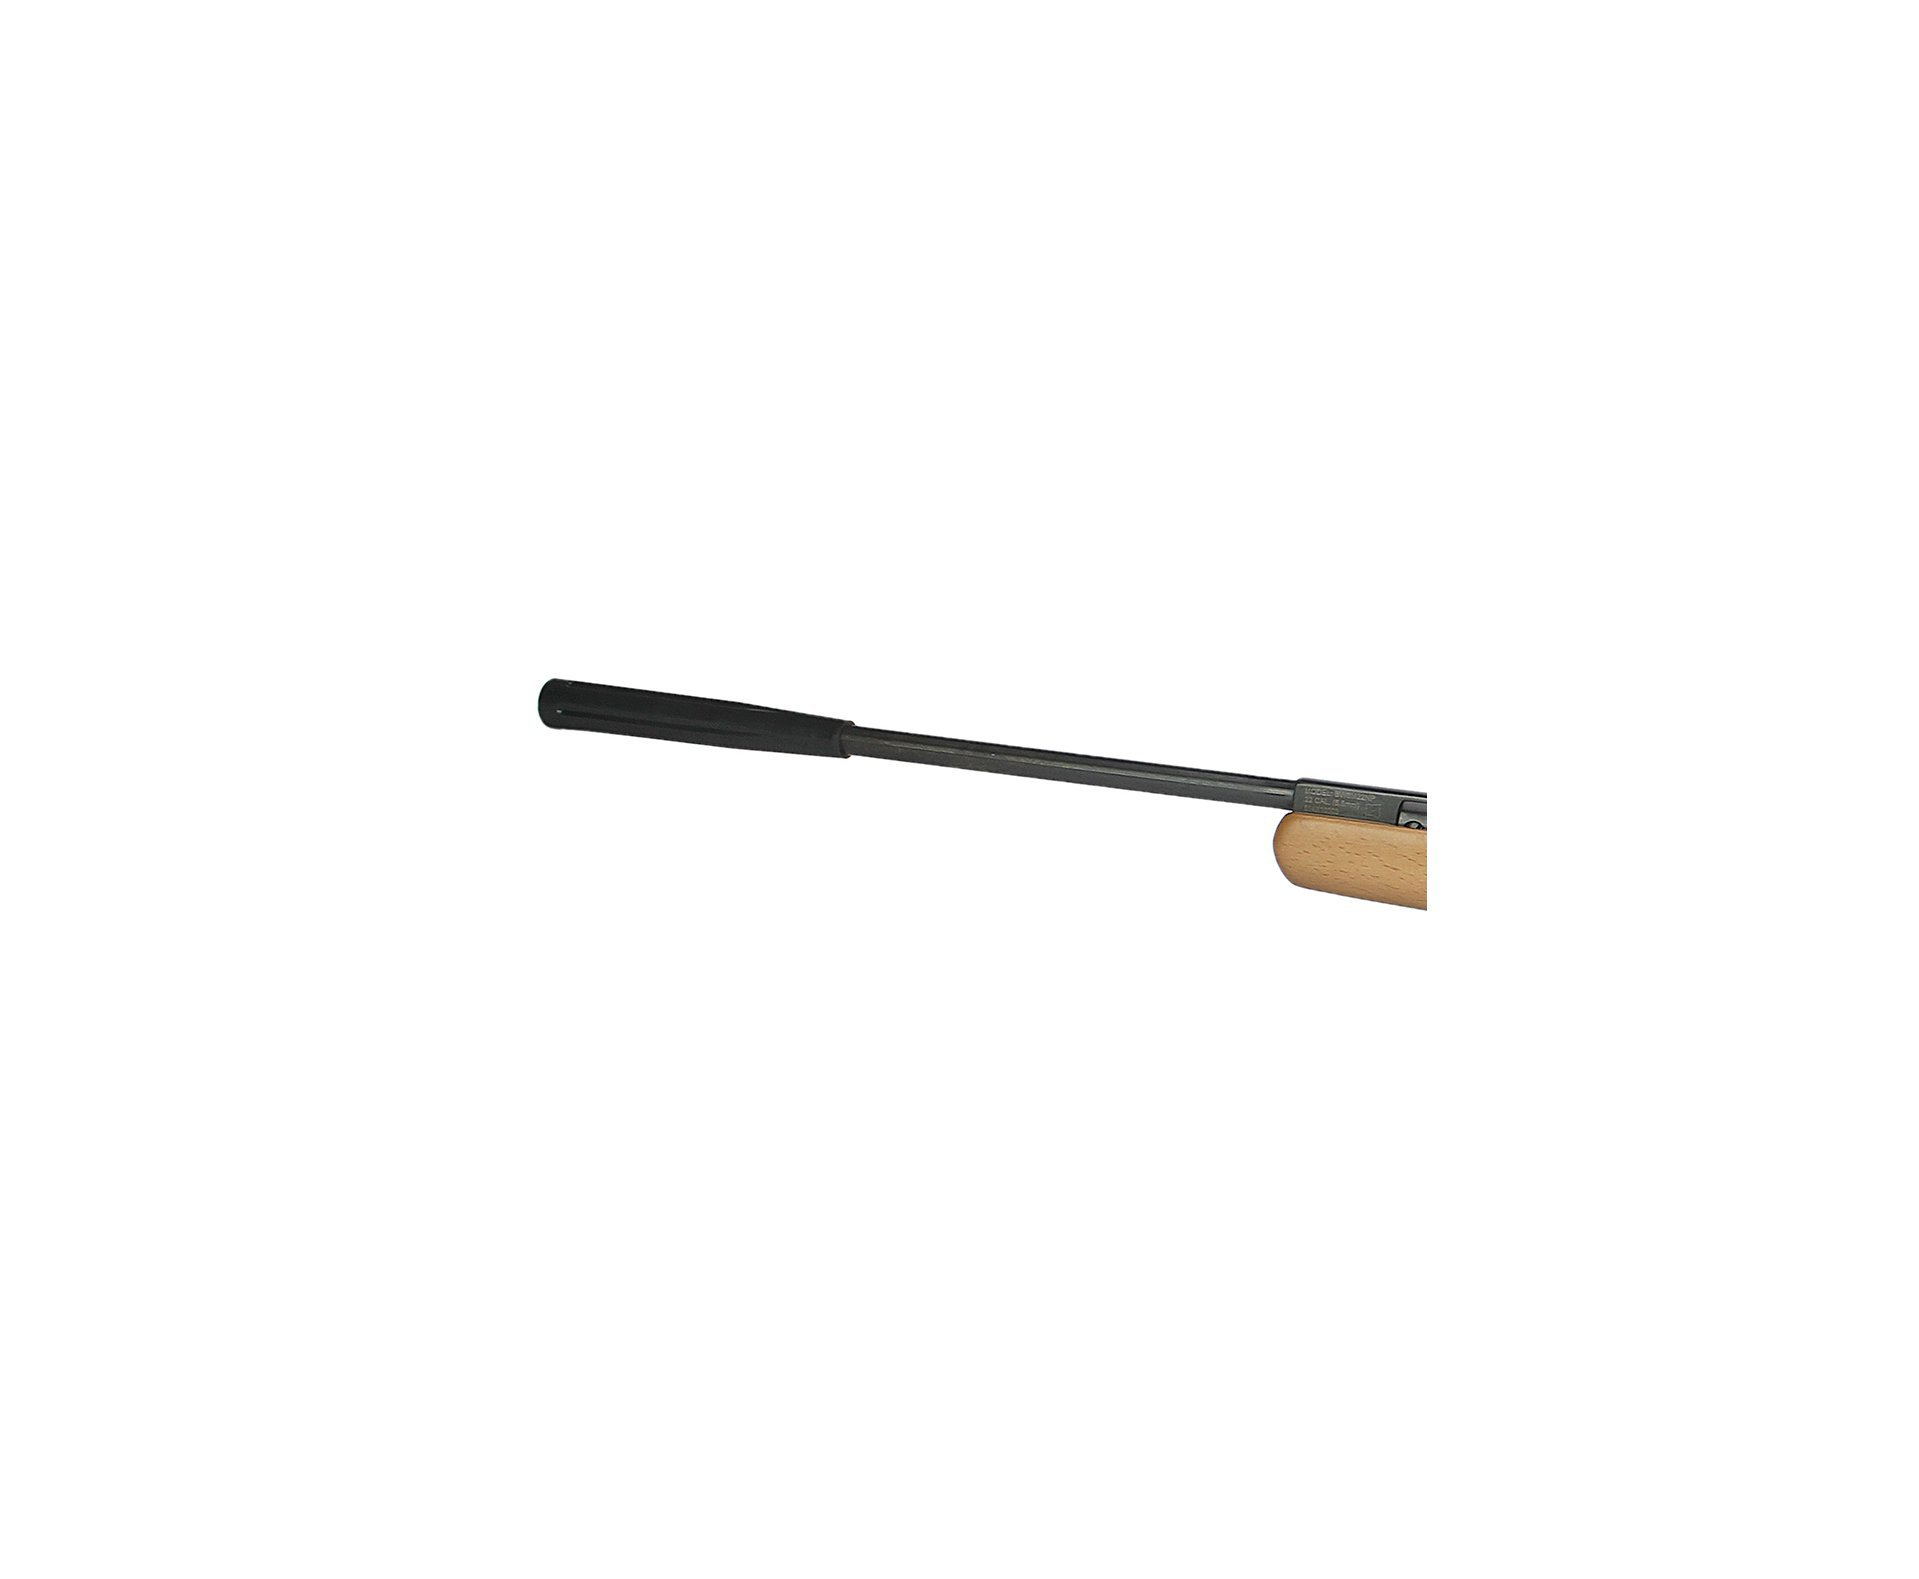 Carabina De Pressão Benjamin Titan Gp - Calibre 5,5mm + Luneta 4x32 Center Point - Benjamin